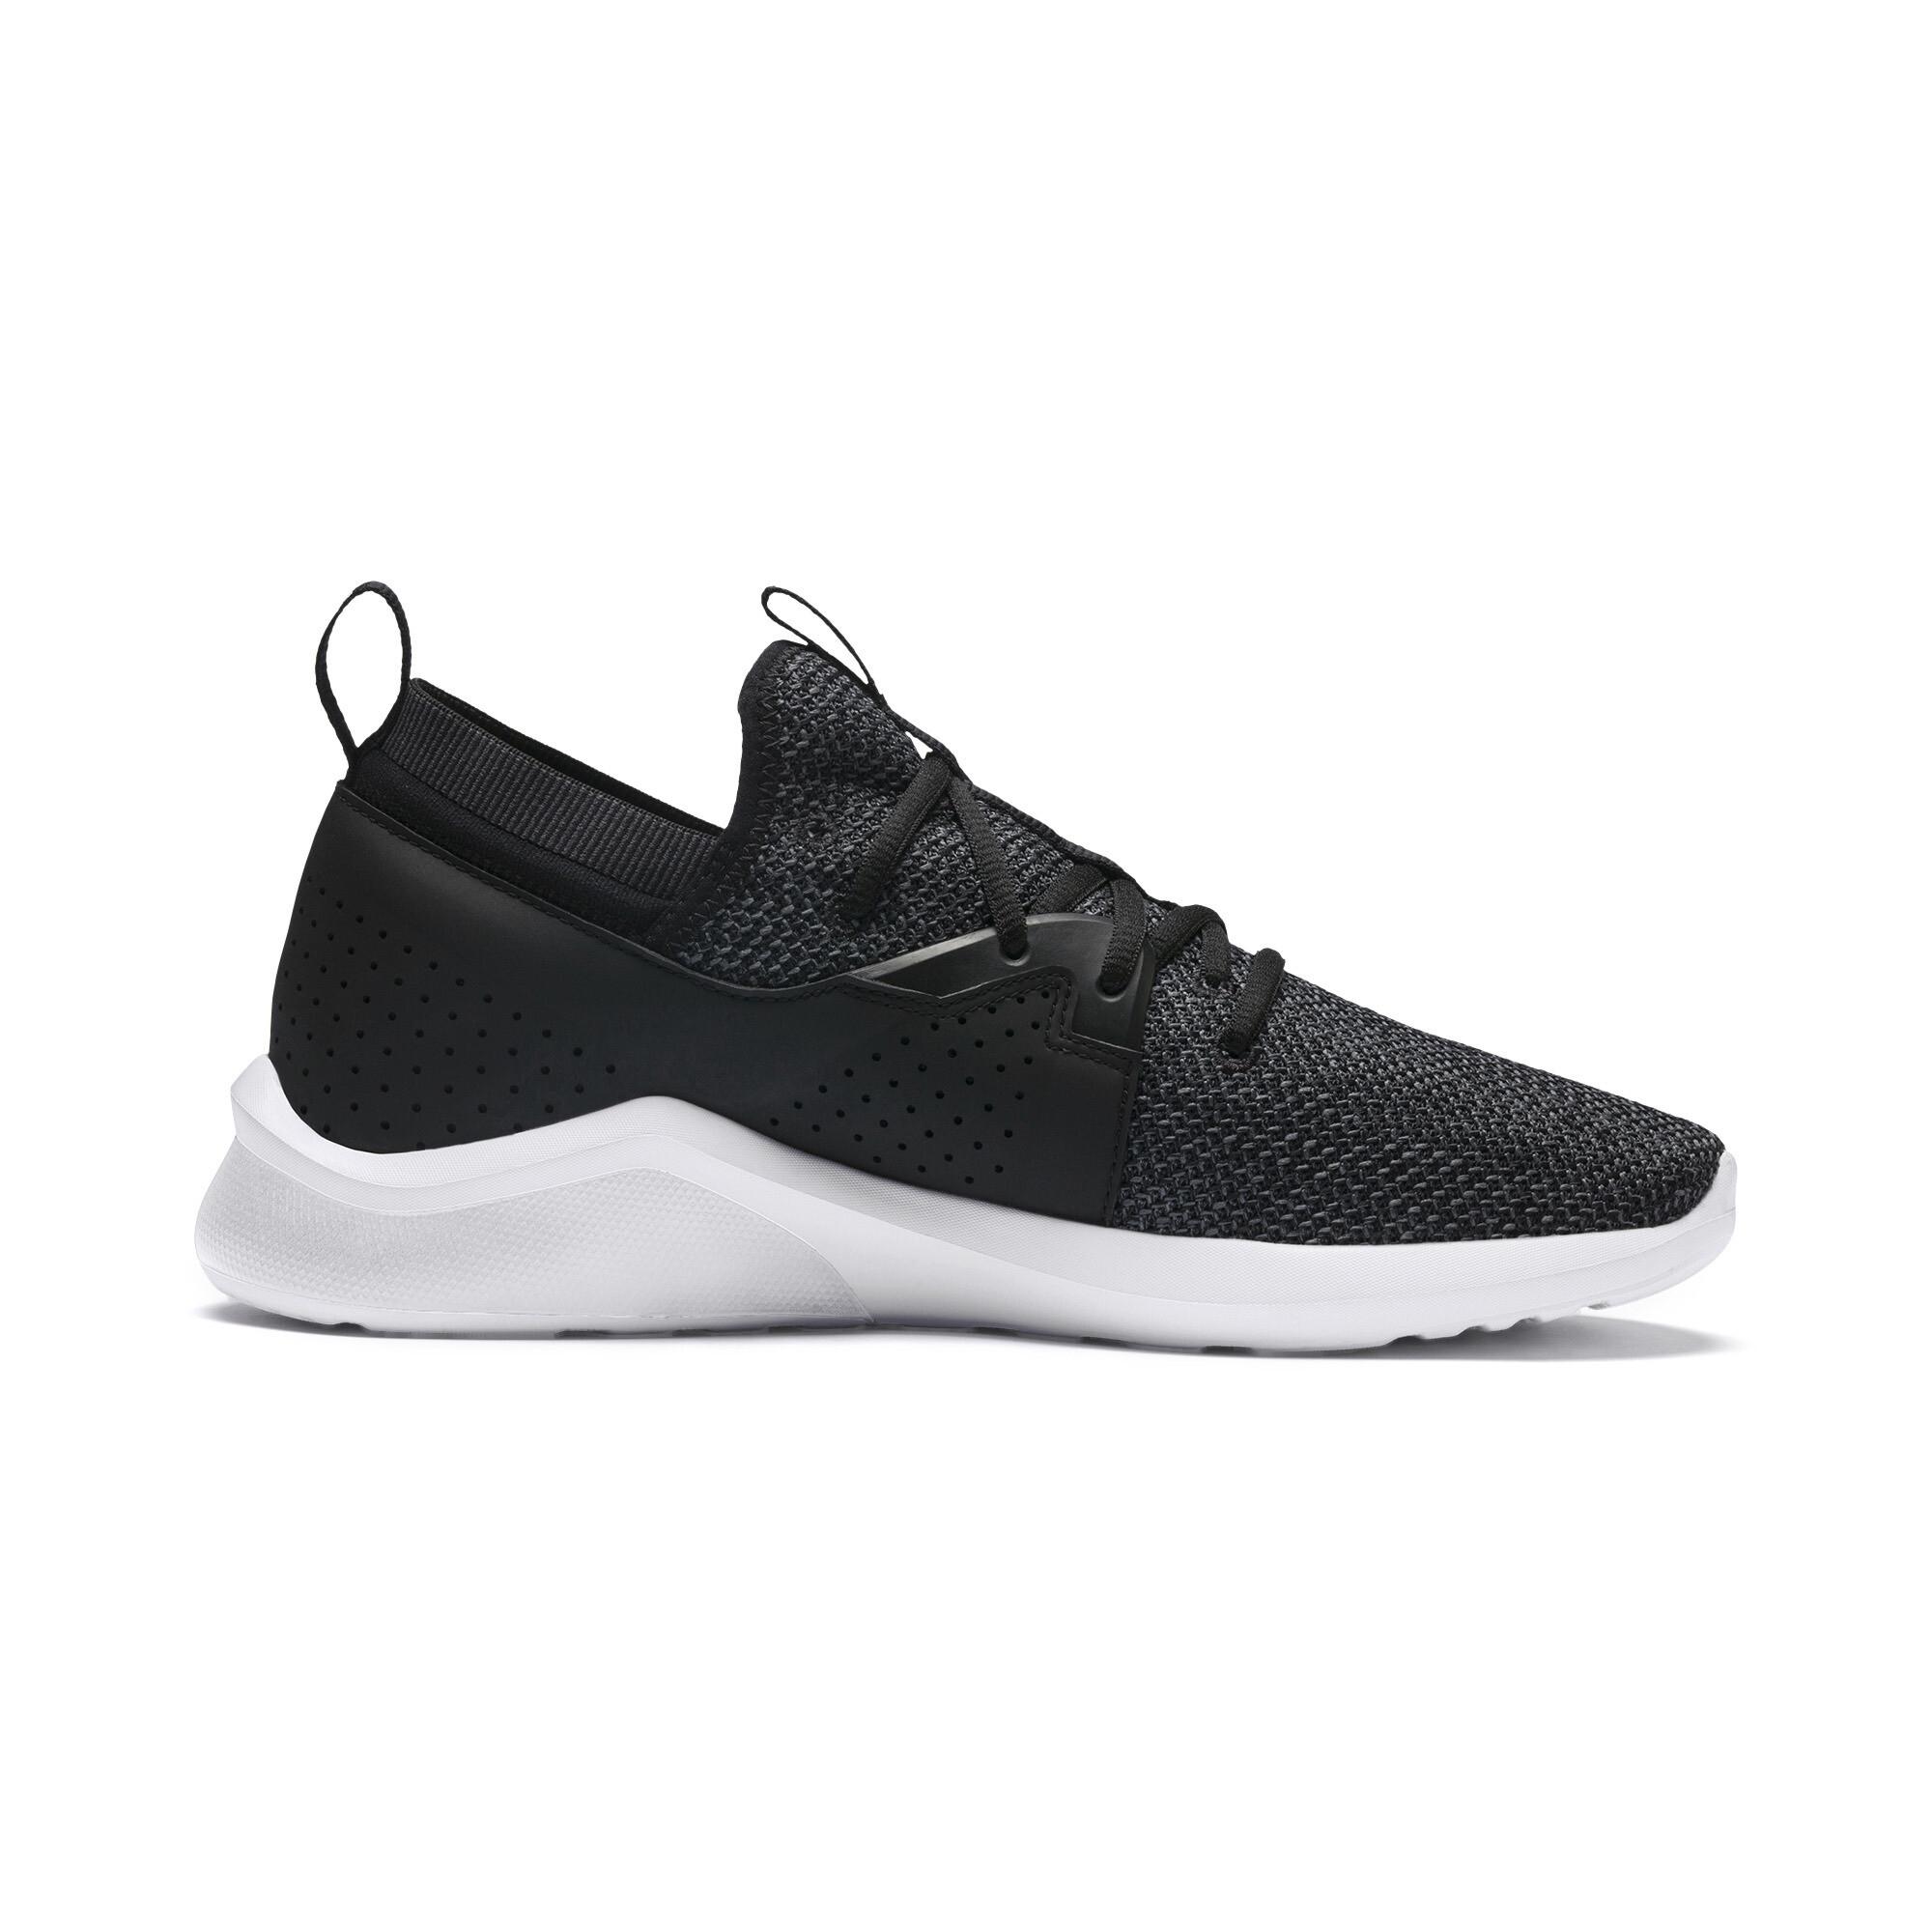 PUMA-Emergence-Men-039-s-Sneakers-Men-Shoe-Running thumbnail 6